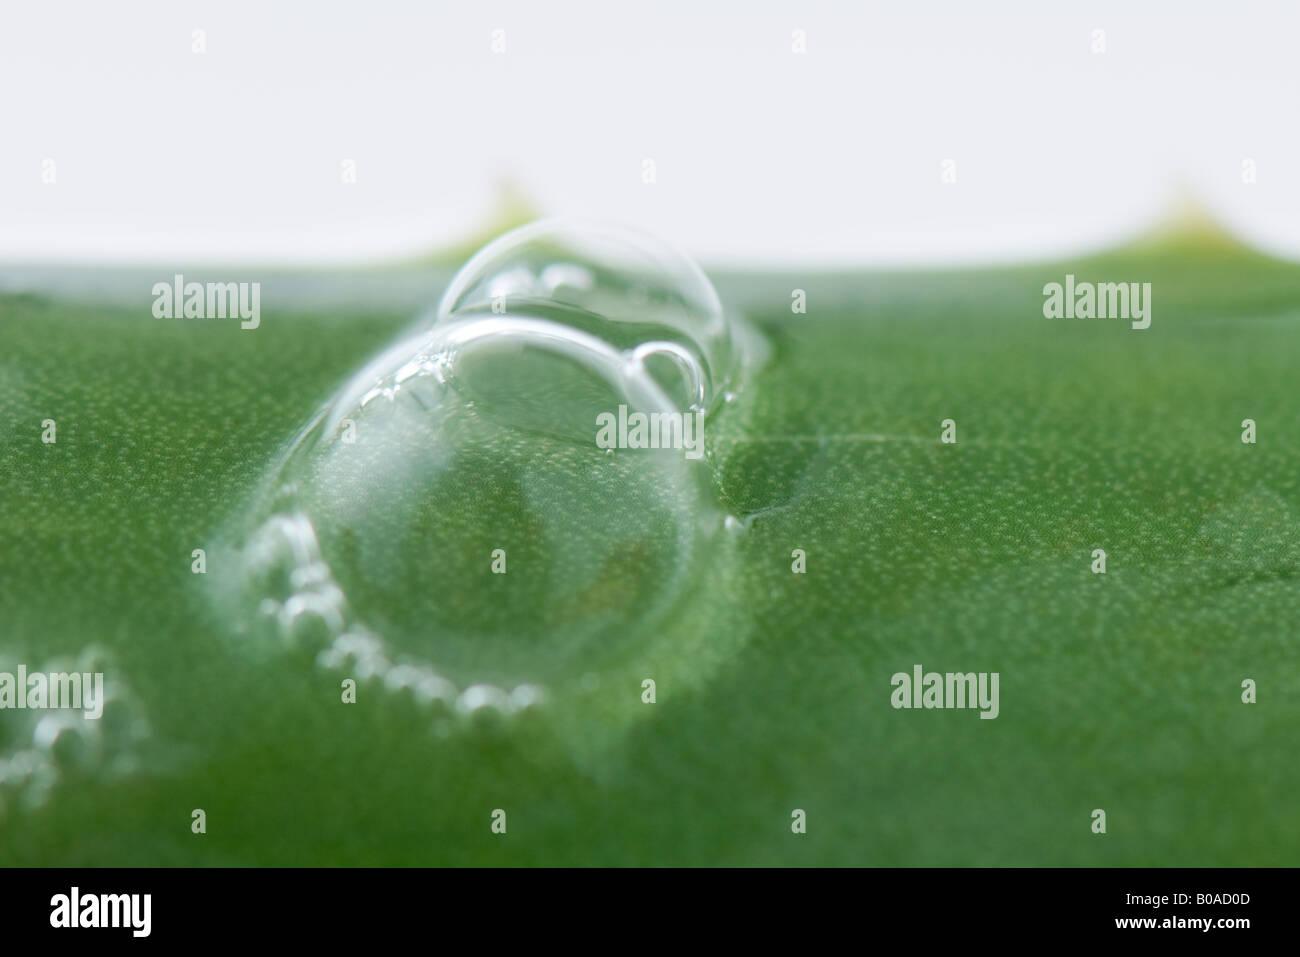 Bubbles on aloe vera leaf, extreme close-up - Stock Image